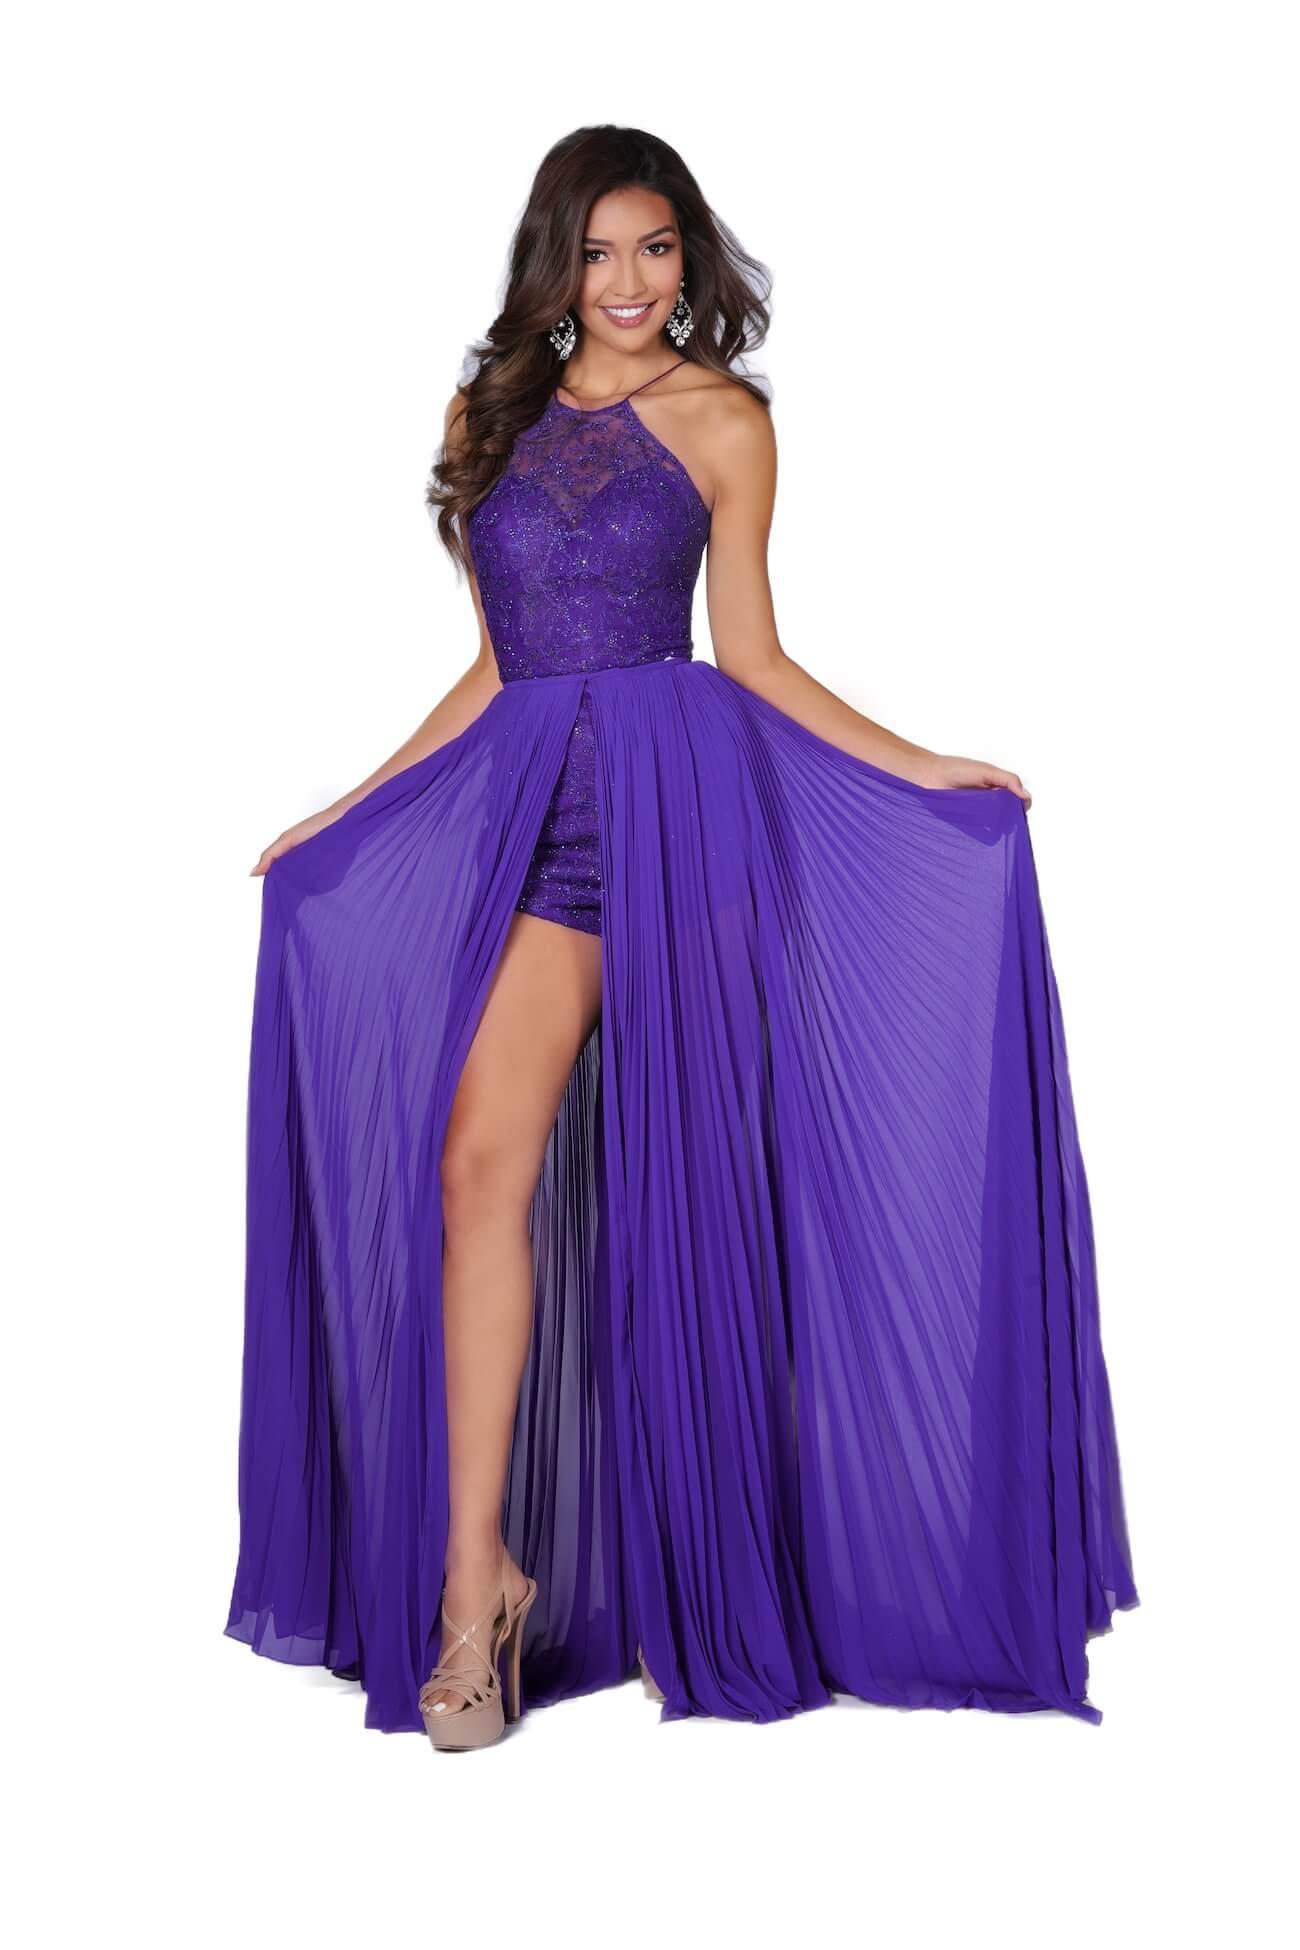 Vienna Purple Size 4 Overskirt Halter Romper/Jumpsuit Dress on Queenly